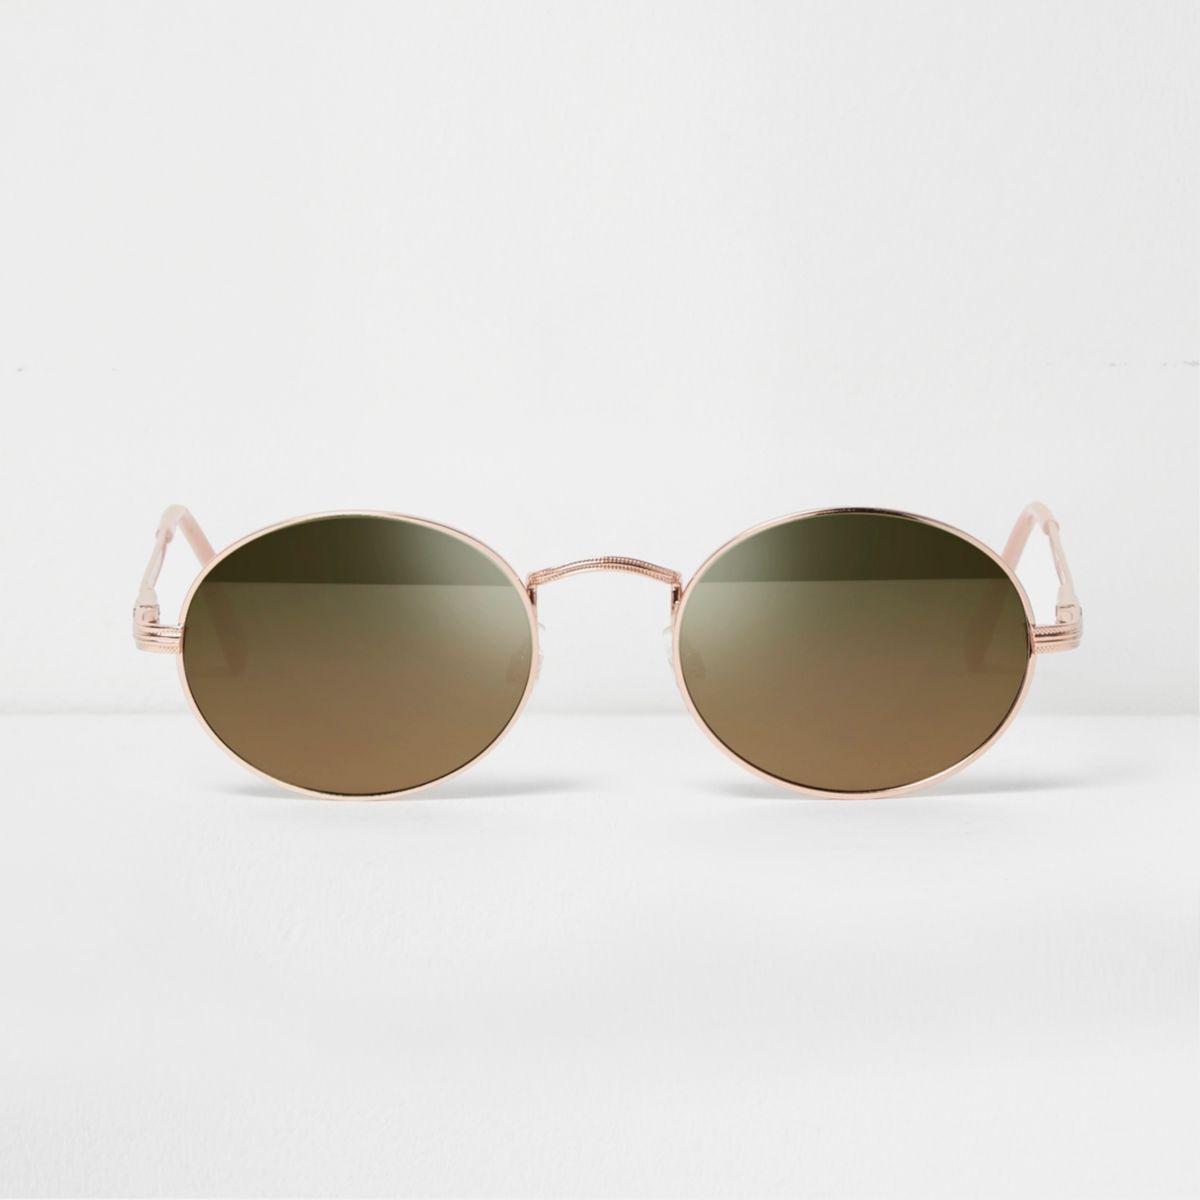 Rose gold tone oval mirror sunglasses